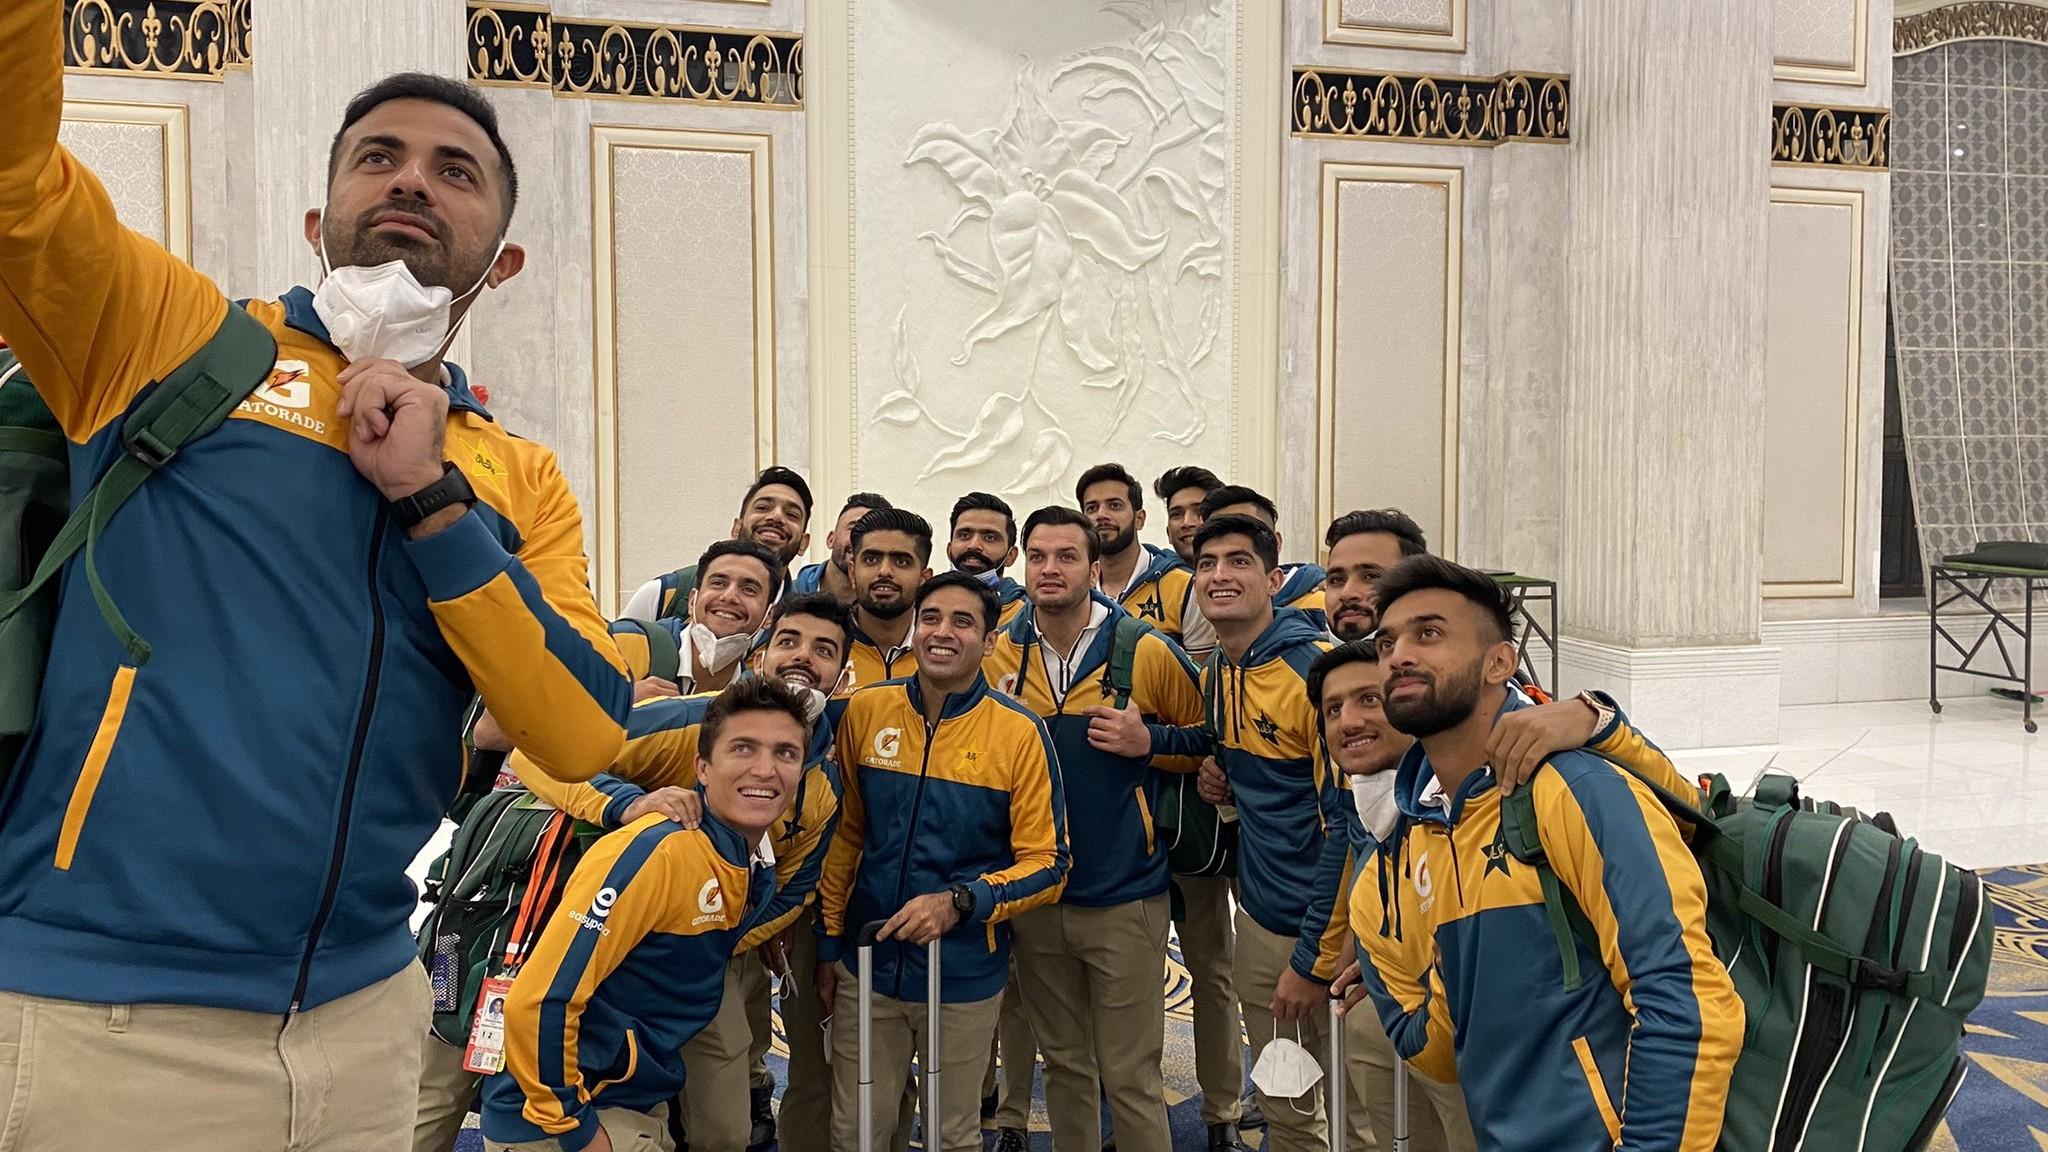 NZ v PAK 2020-21: PCB confirms 8 COVID-19 positive cases in Pakistan team